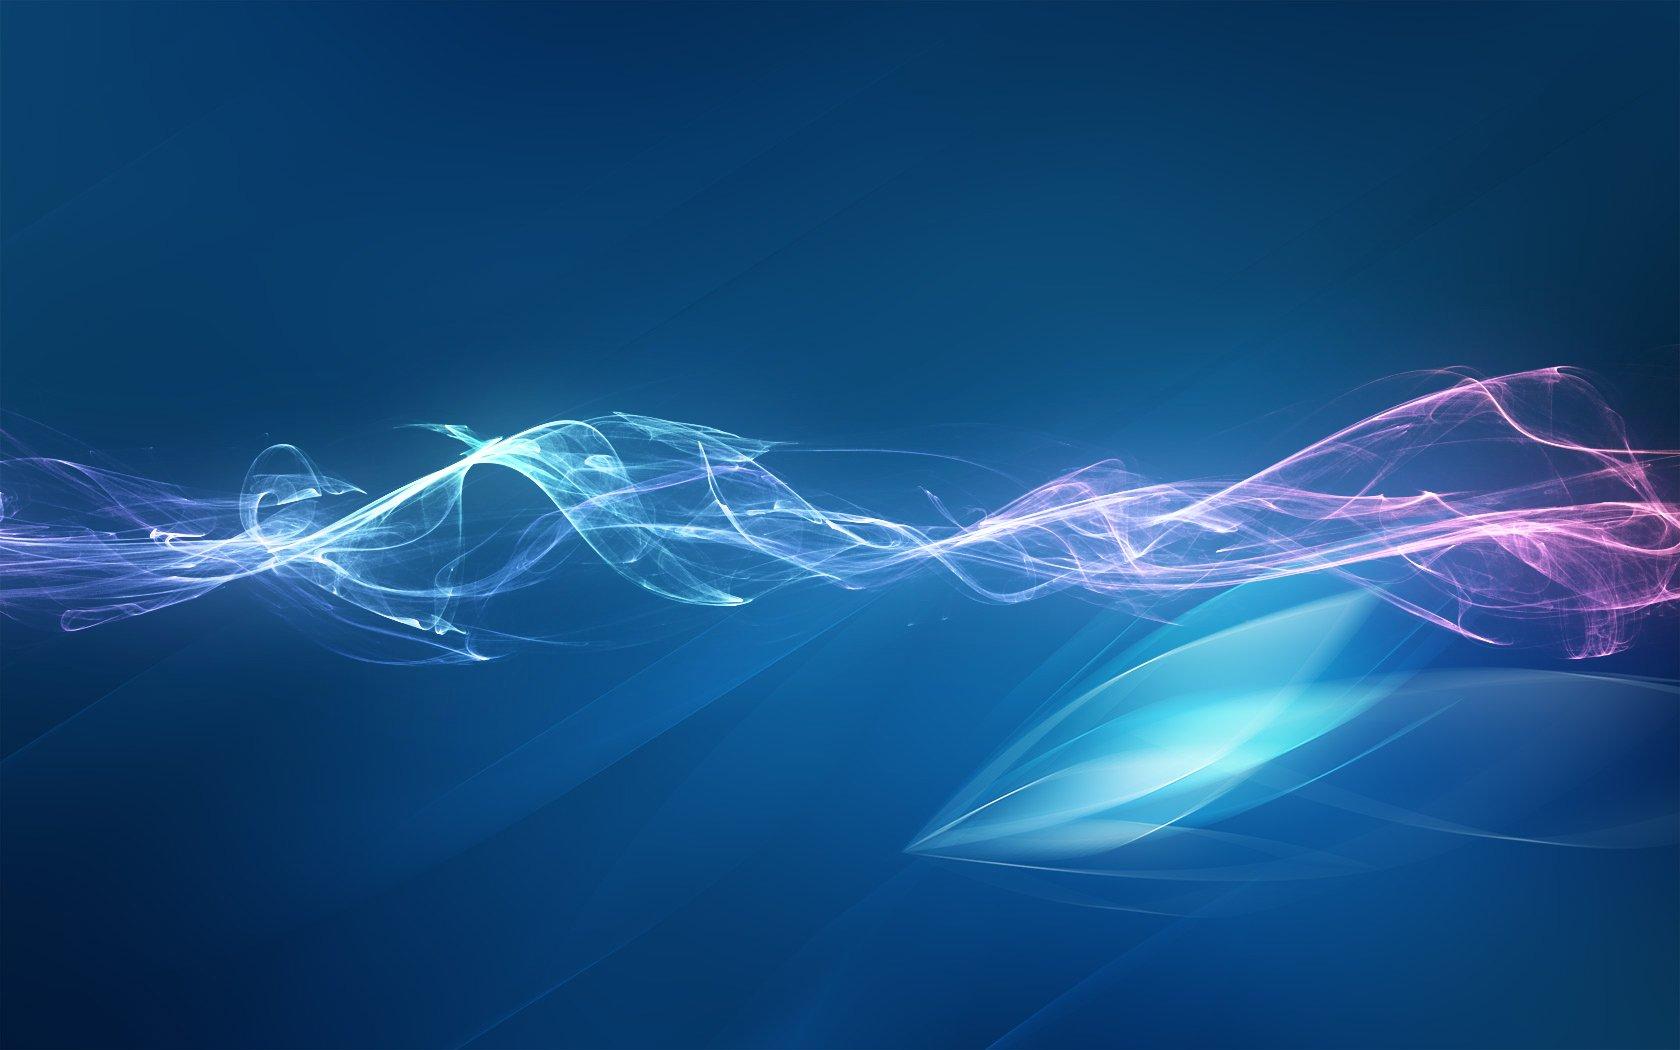 Blue Computer Wallpapers Desktop Backgrounds 1680x1050 ID70292 1680x1050